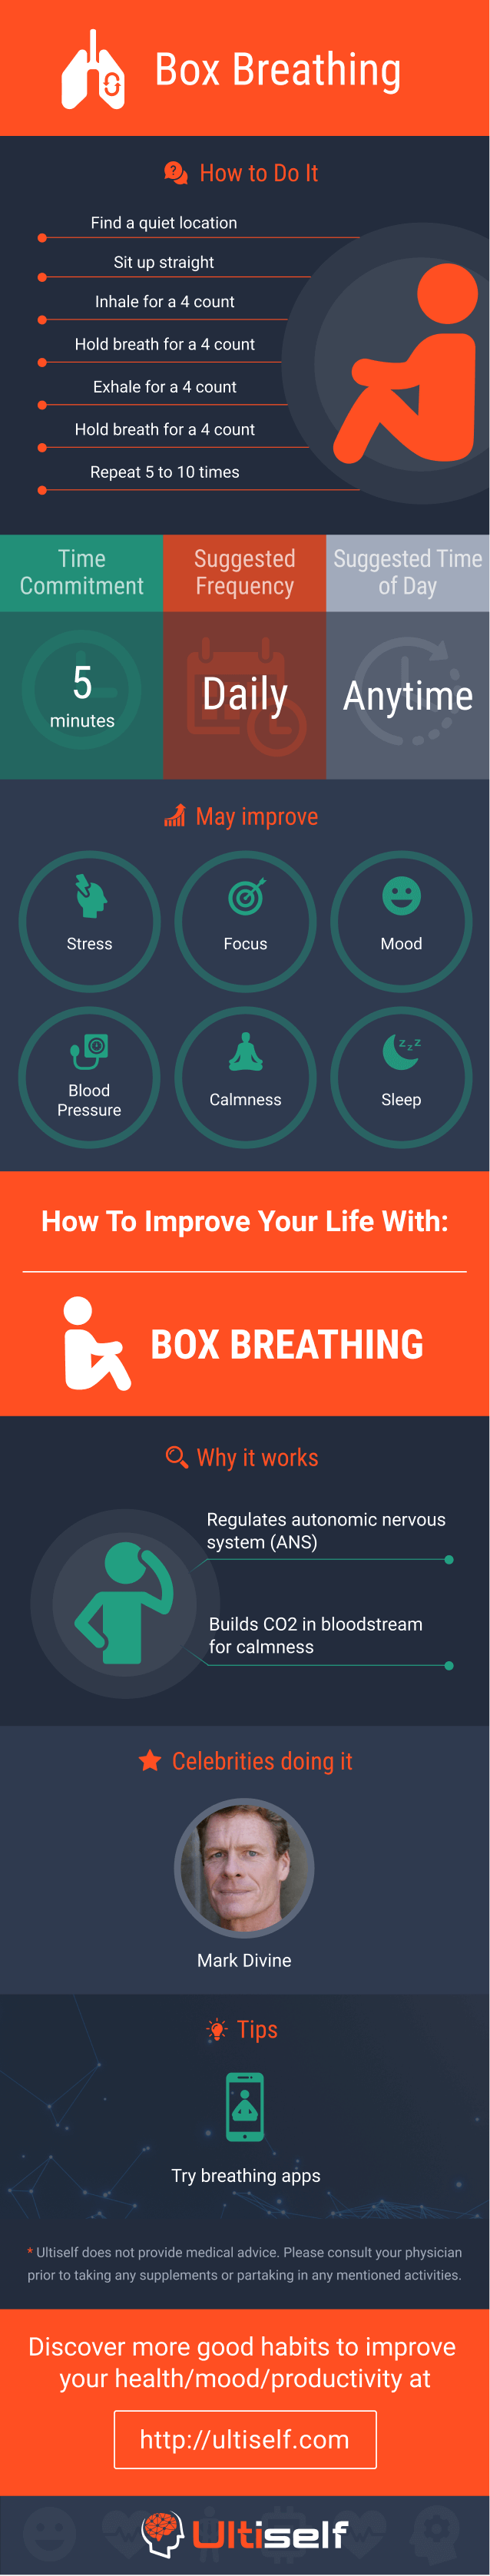 Box Breathing infographic